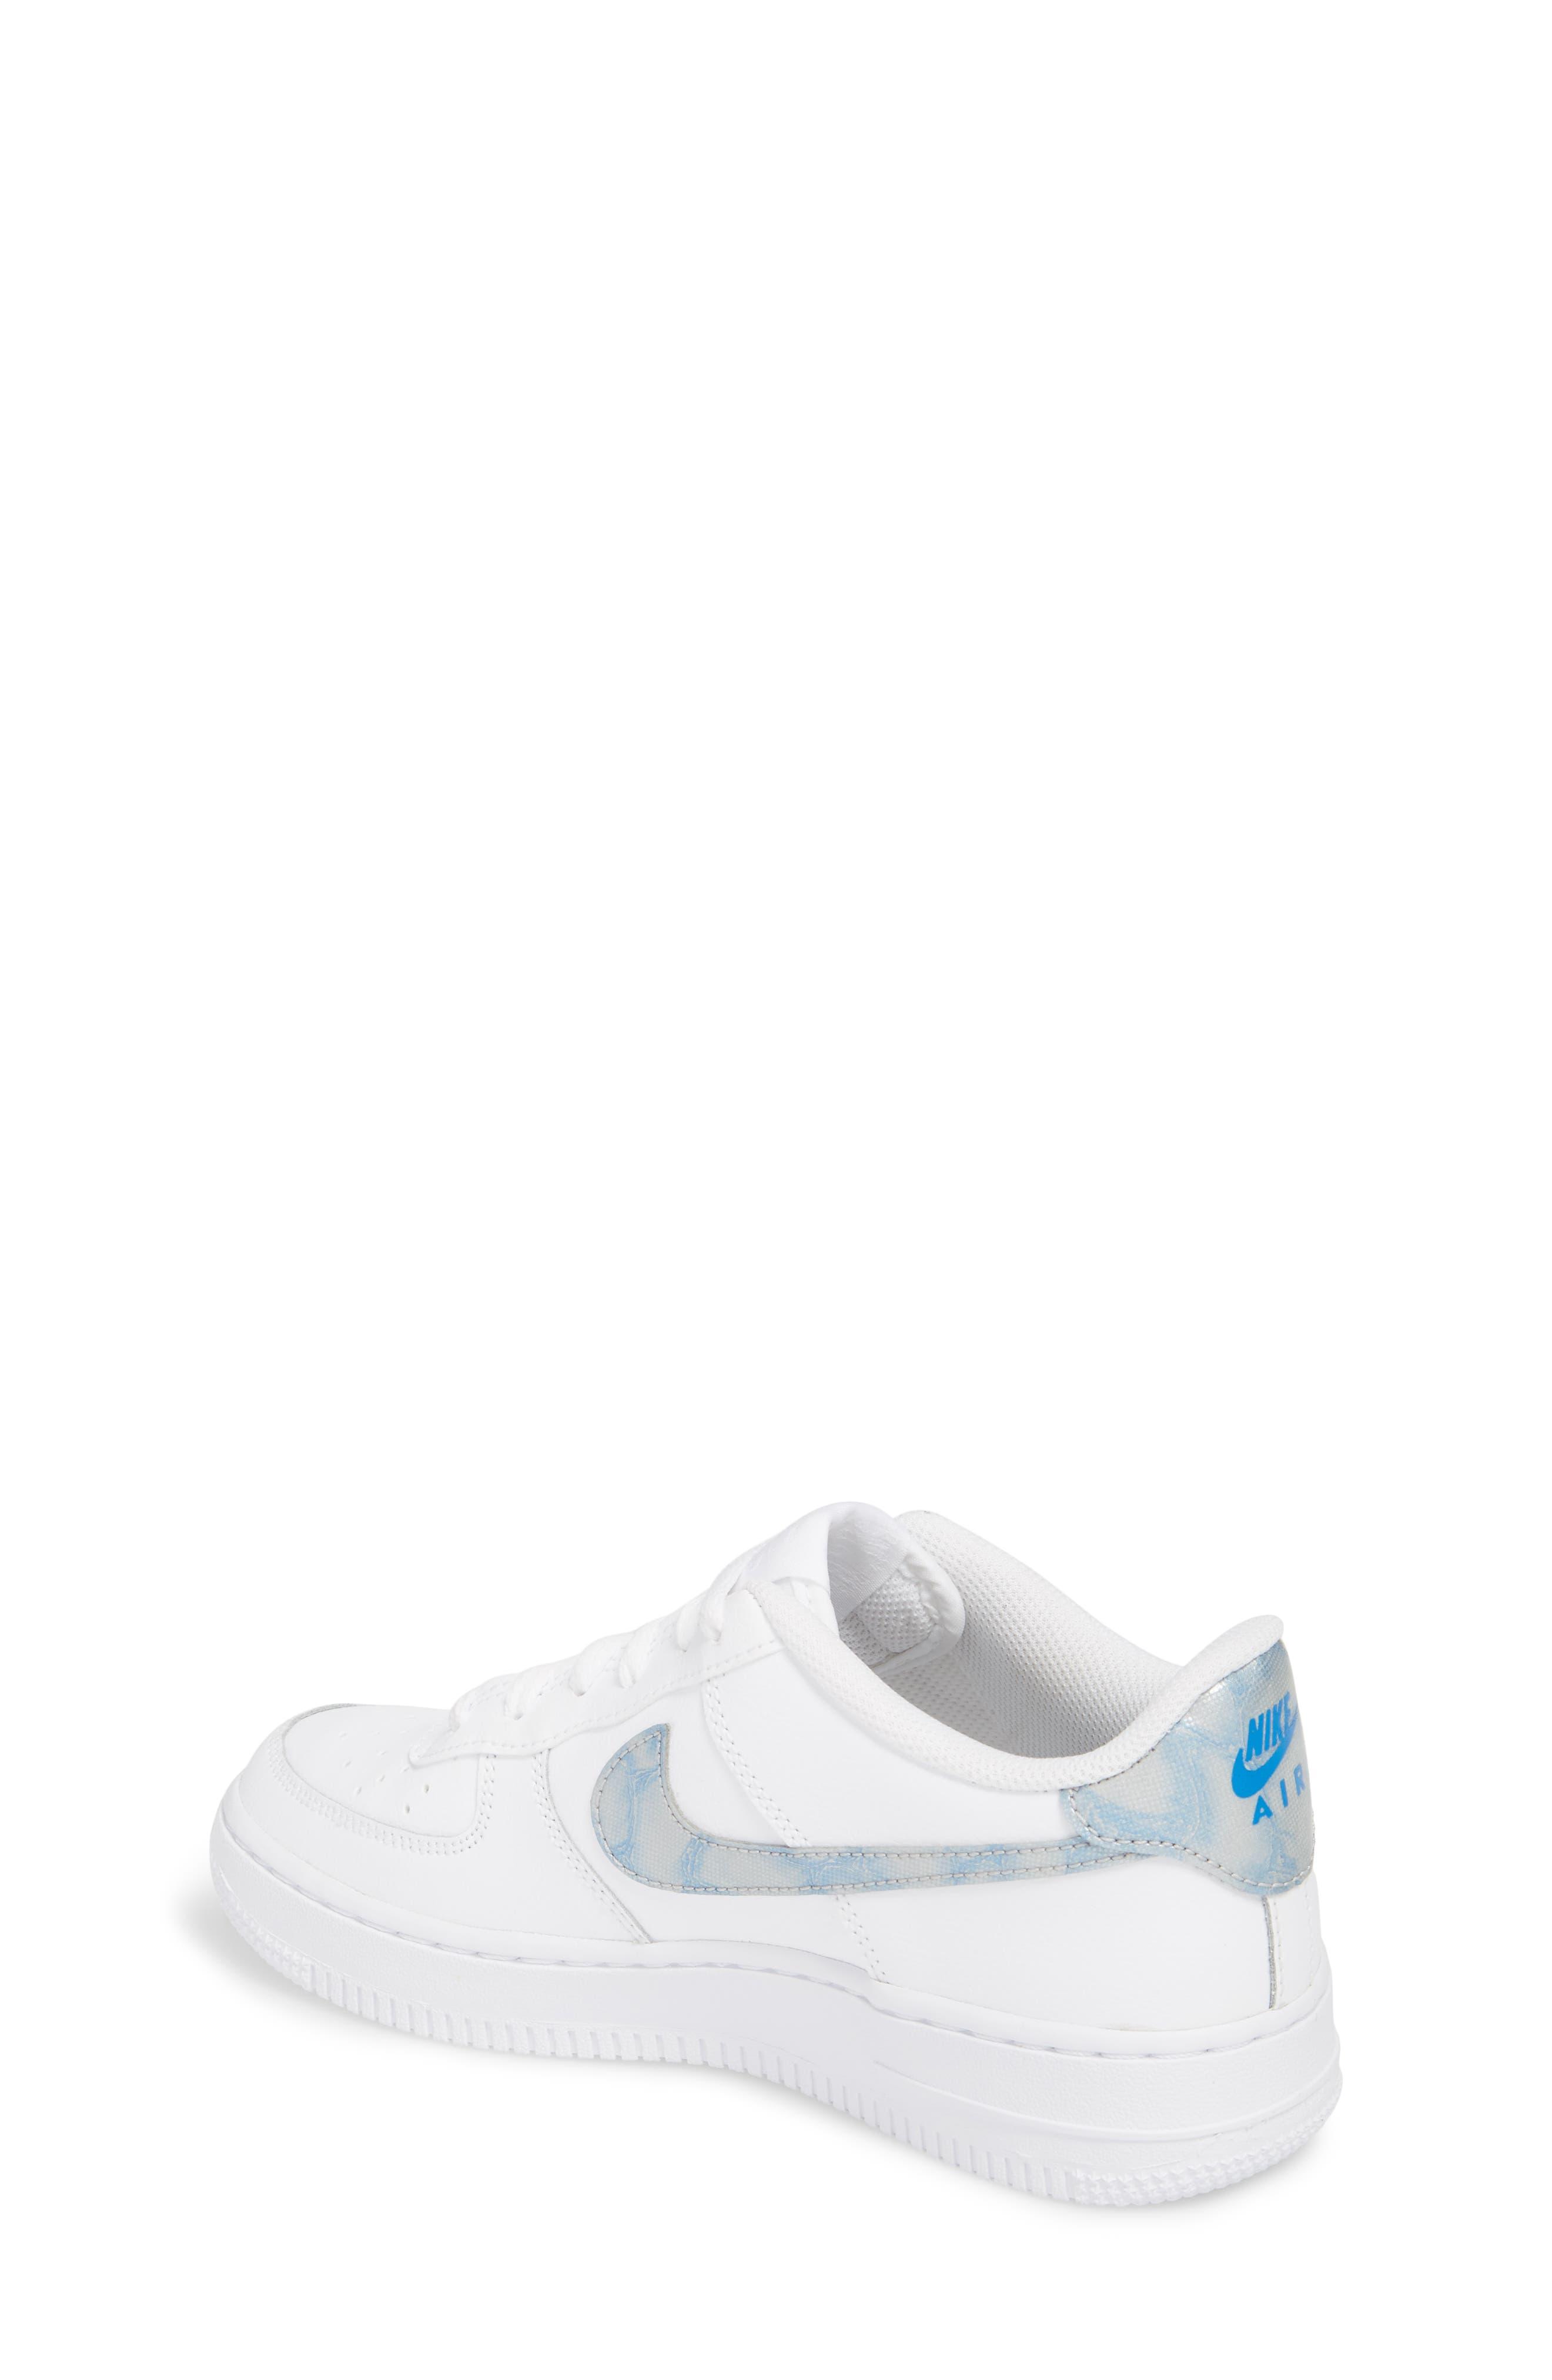 NIKE, Air Force 1 '06 Sneaker, Alternate thumbnail 2, color, 131